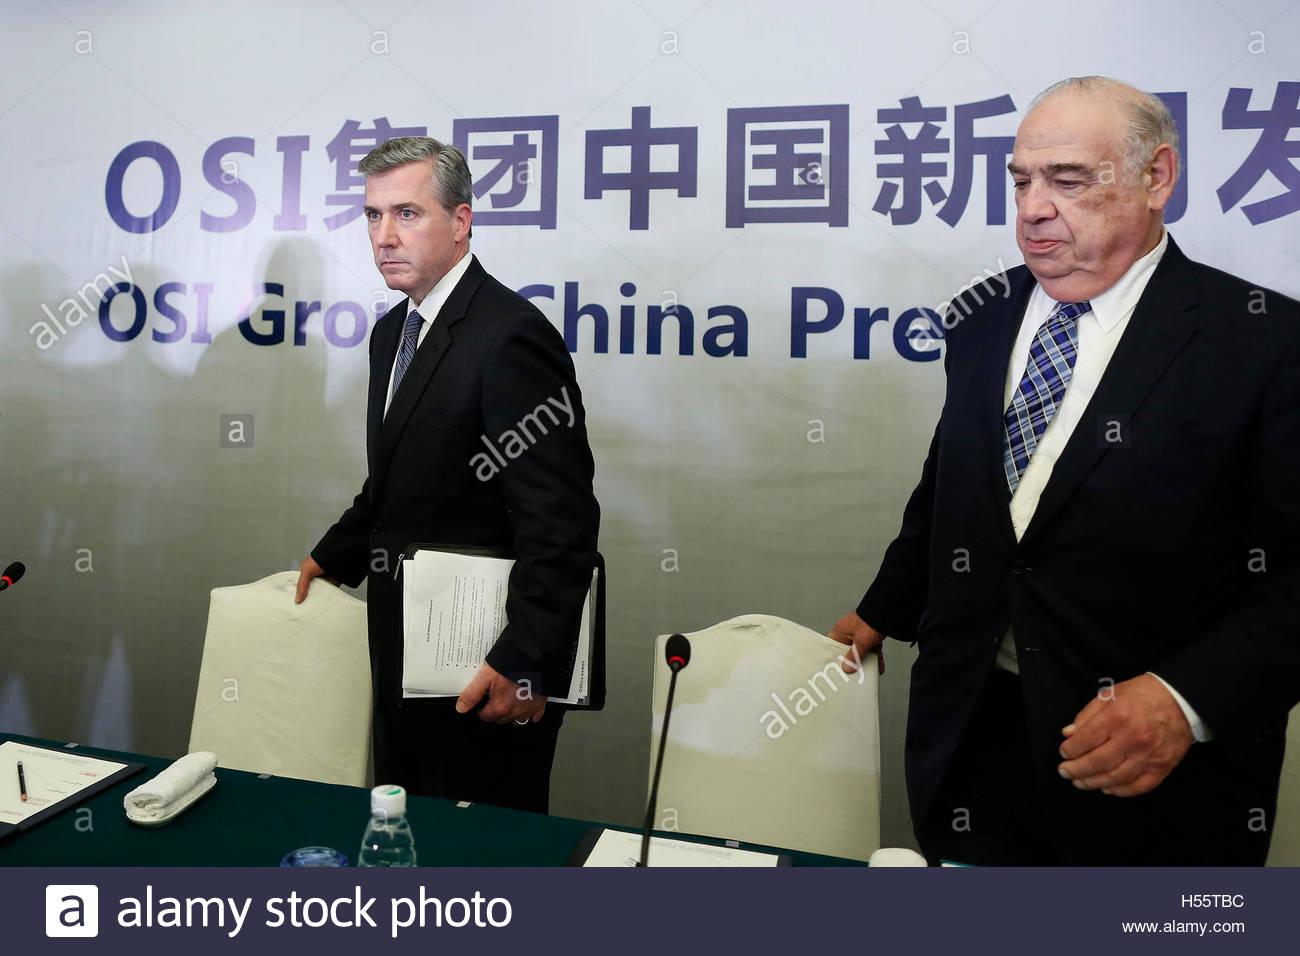 osi stock photos osi stock images alamy osi group chairman and ceo sheldon lavin r and osi group president and chief